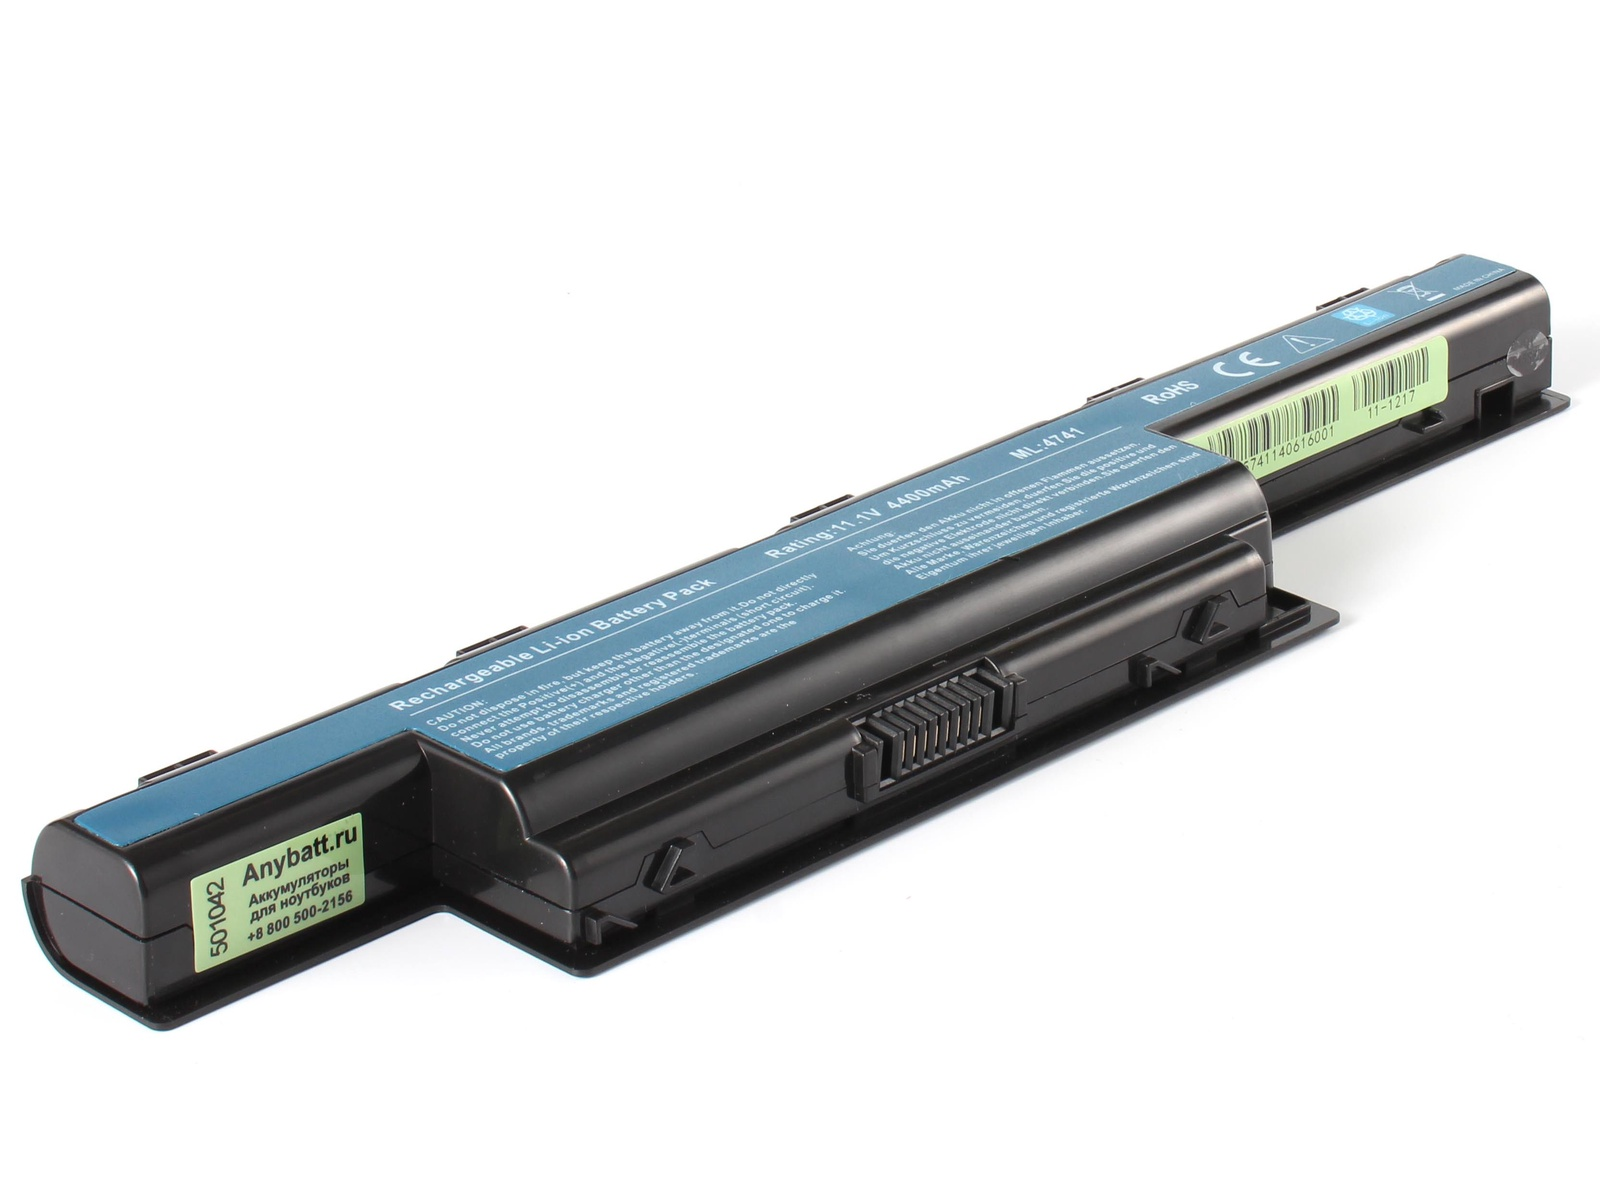 Аккумулятор для ноутбука AnyBatt для Acer Aspire 7741G-5464G50Mikk, Aspire V3-551-10468G50Makk, Aspire V3-571G-33114G50MAII, eMachines E640G-P342G25Mnks, Aspire 5349-B812G50Mnkk, Aspire 5560G-4333G32Mnkk, Aspire 5741Z